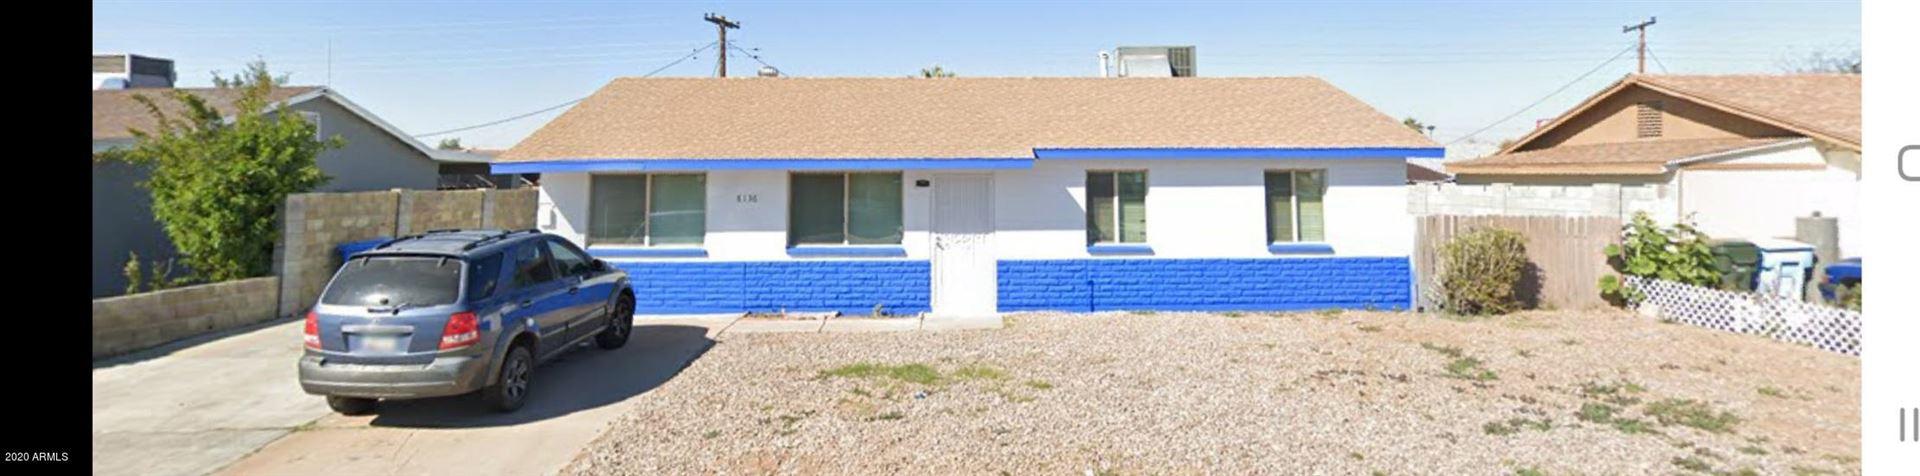 8136 W FAIRMOUNT Avenue, Phoenix, AZ 85033 - MLS#: 6109019